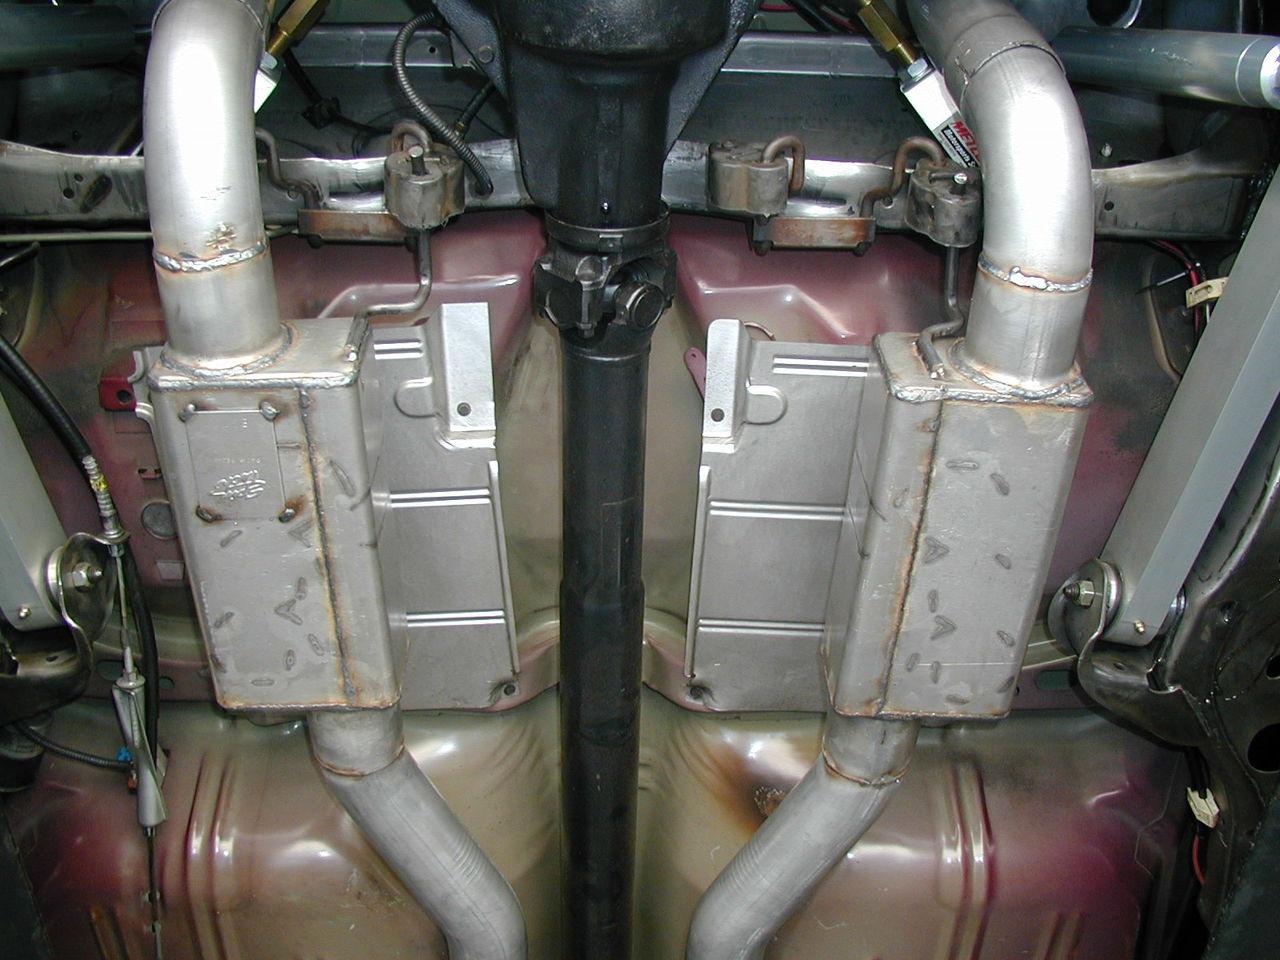 "1X389464 - 3"" Impala System with Pro Street 6000 Mufflers"